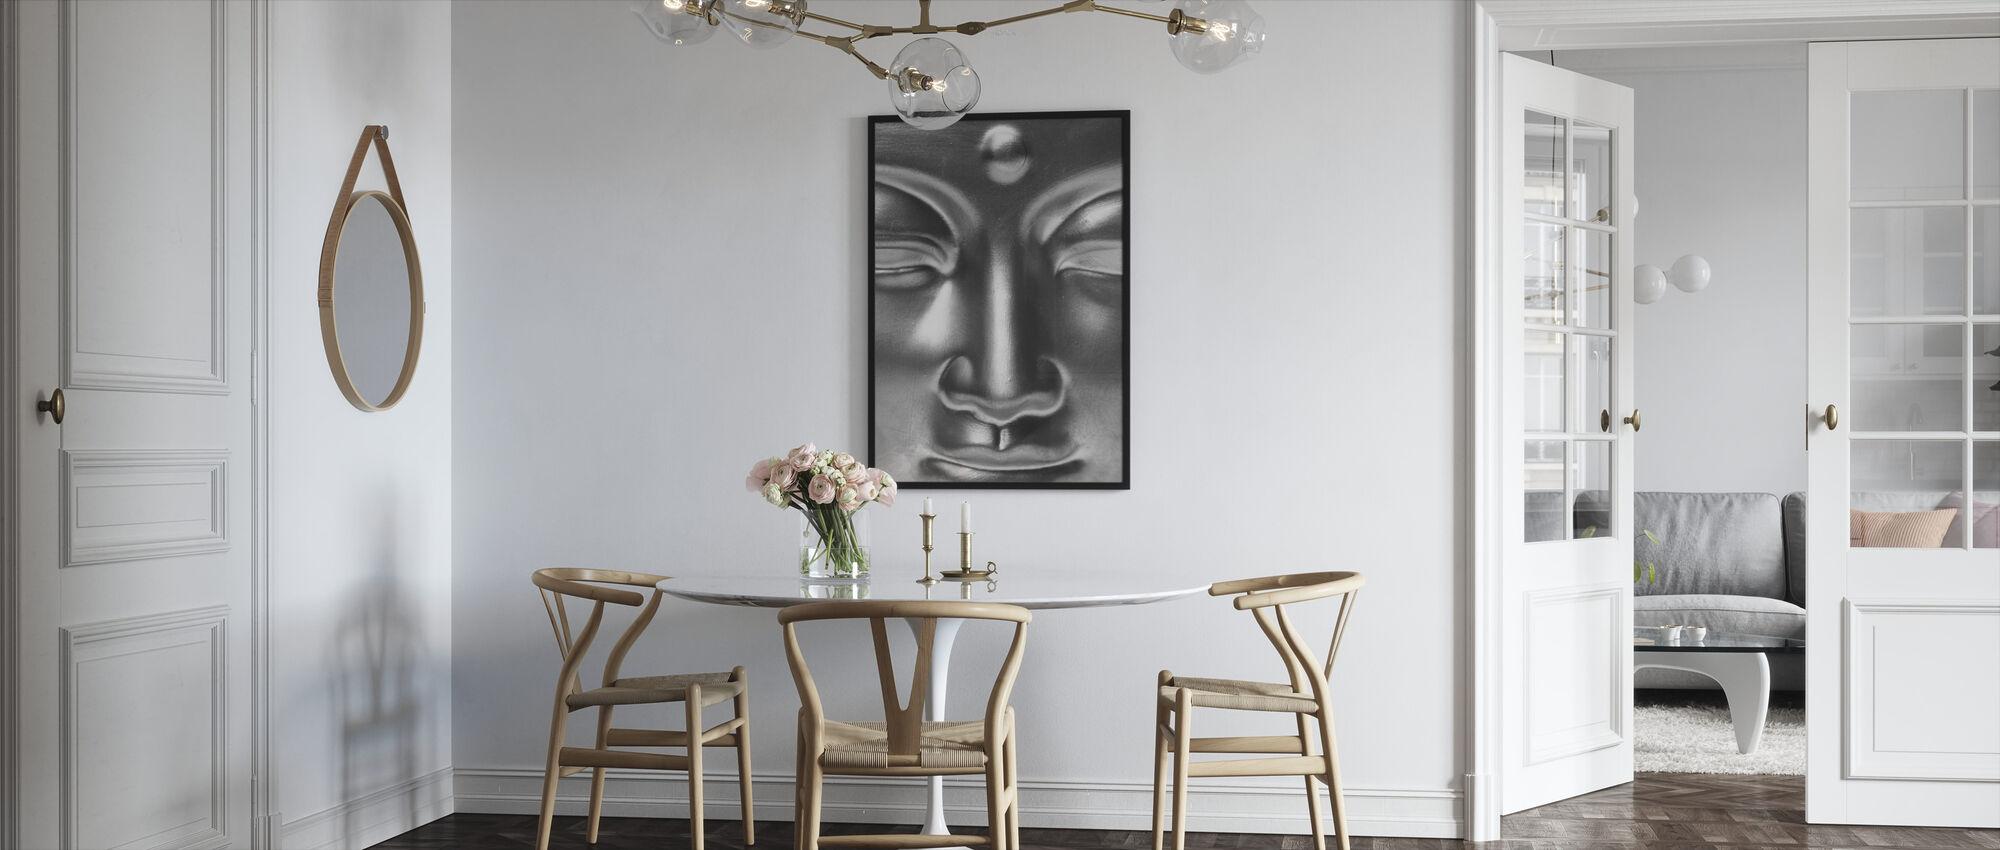 Gouden Boeddha Close Up - z/w - Ingelijste print - Keuken